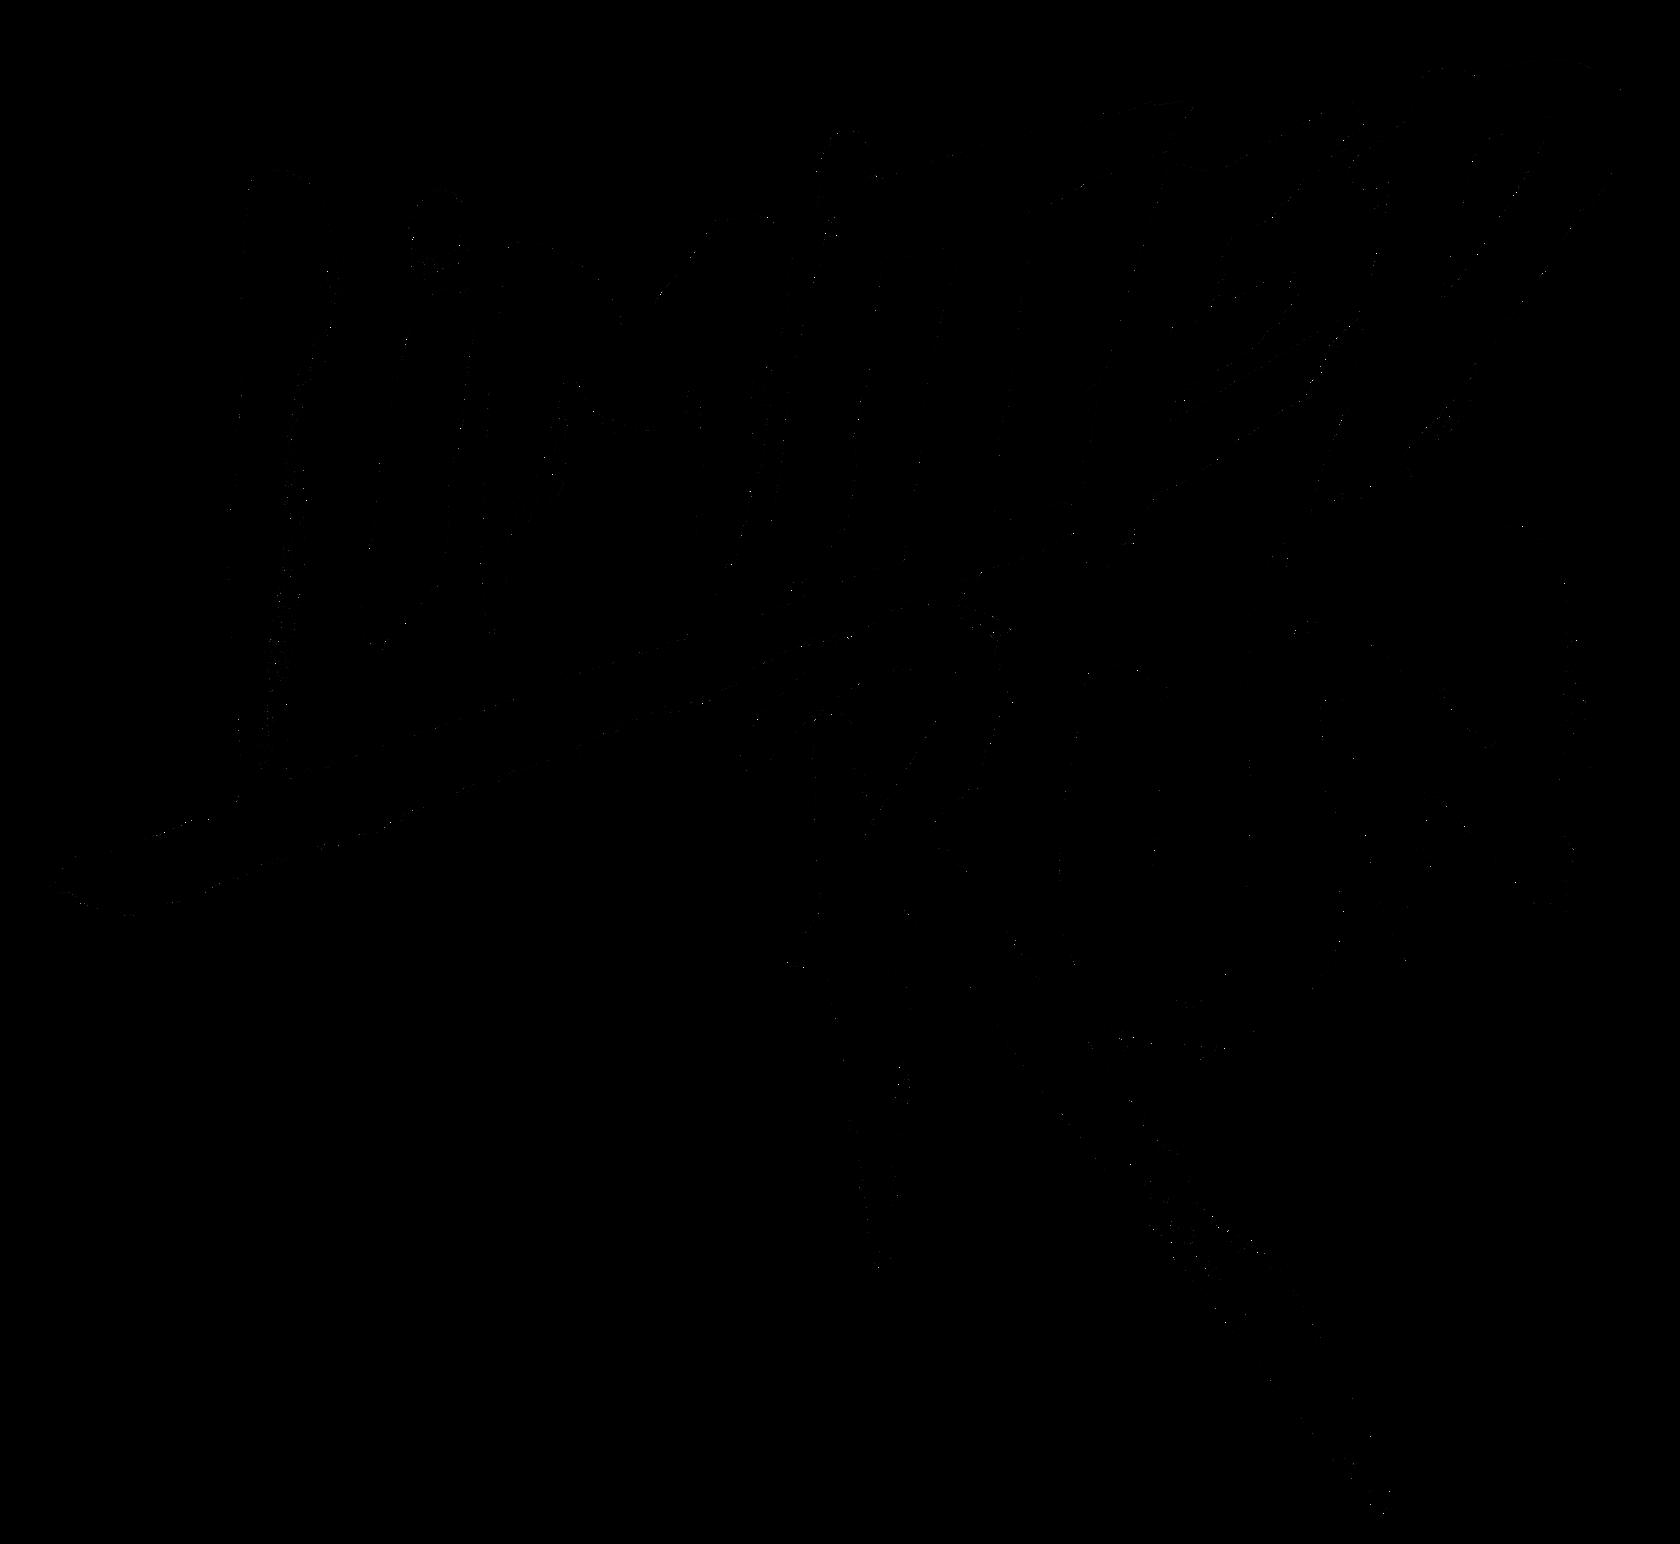 LimitedRun-Black.png